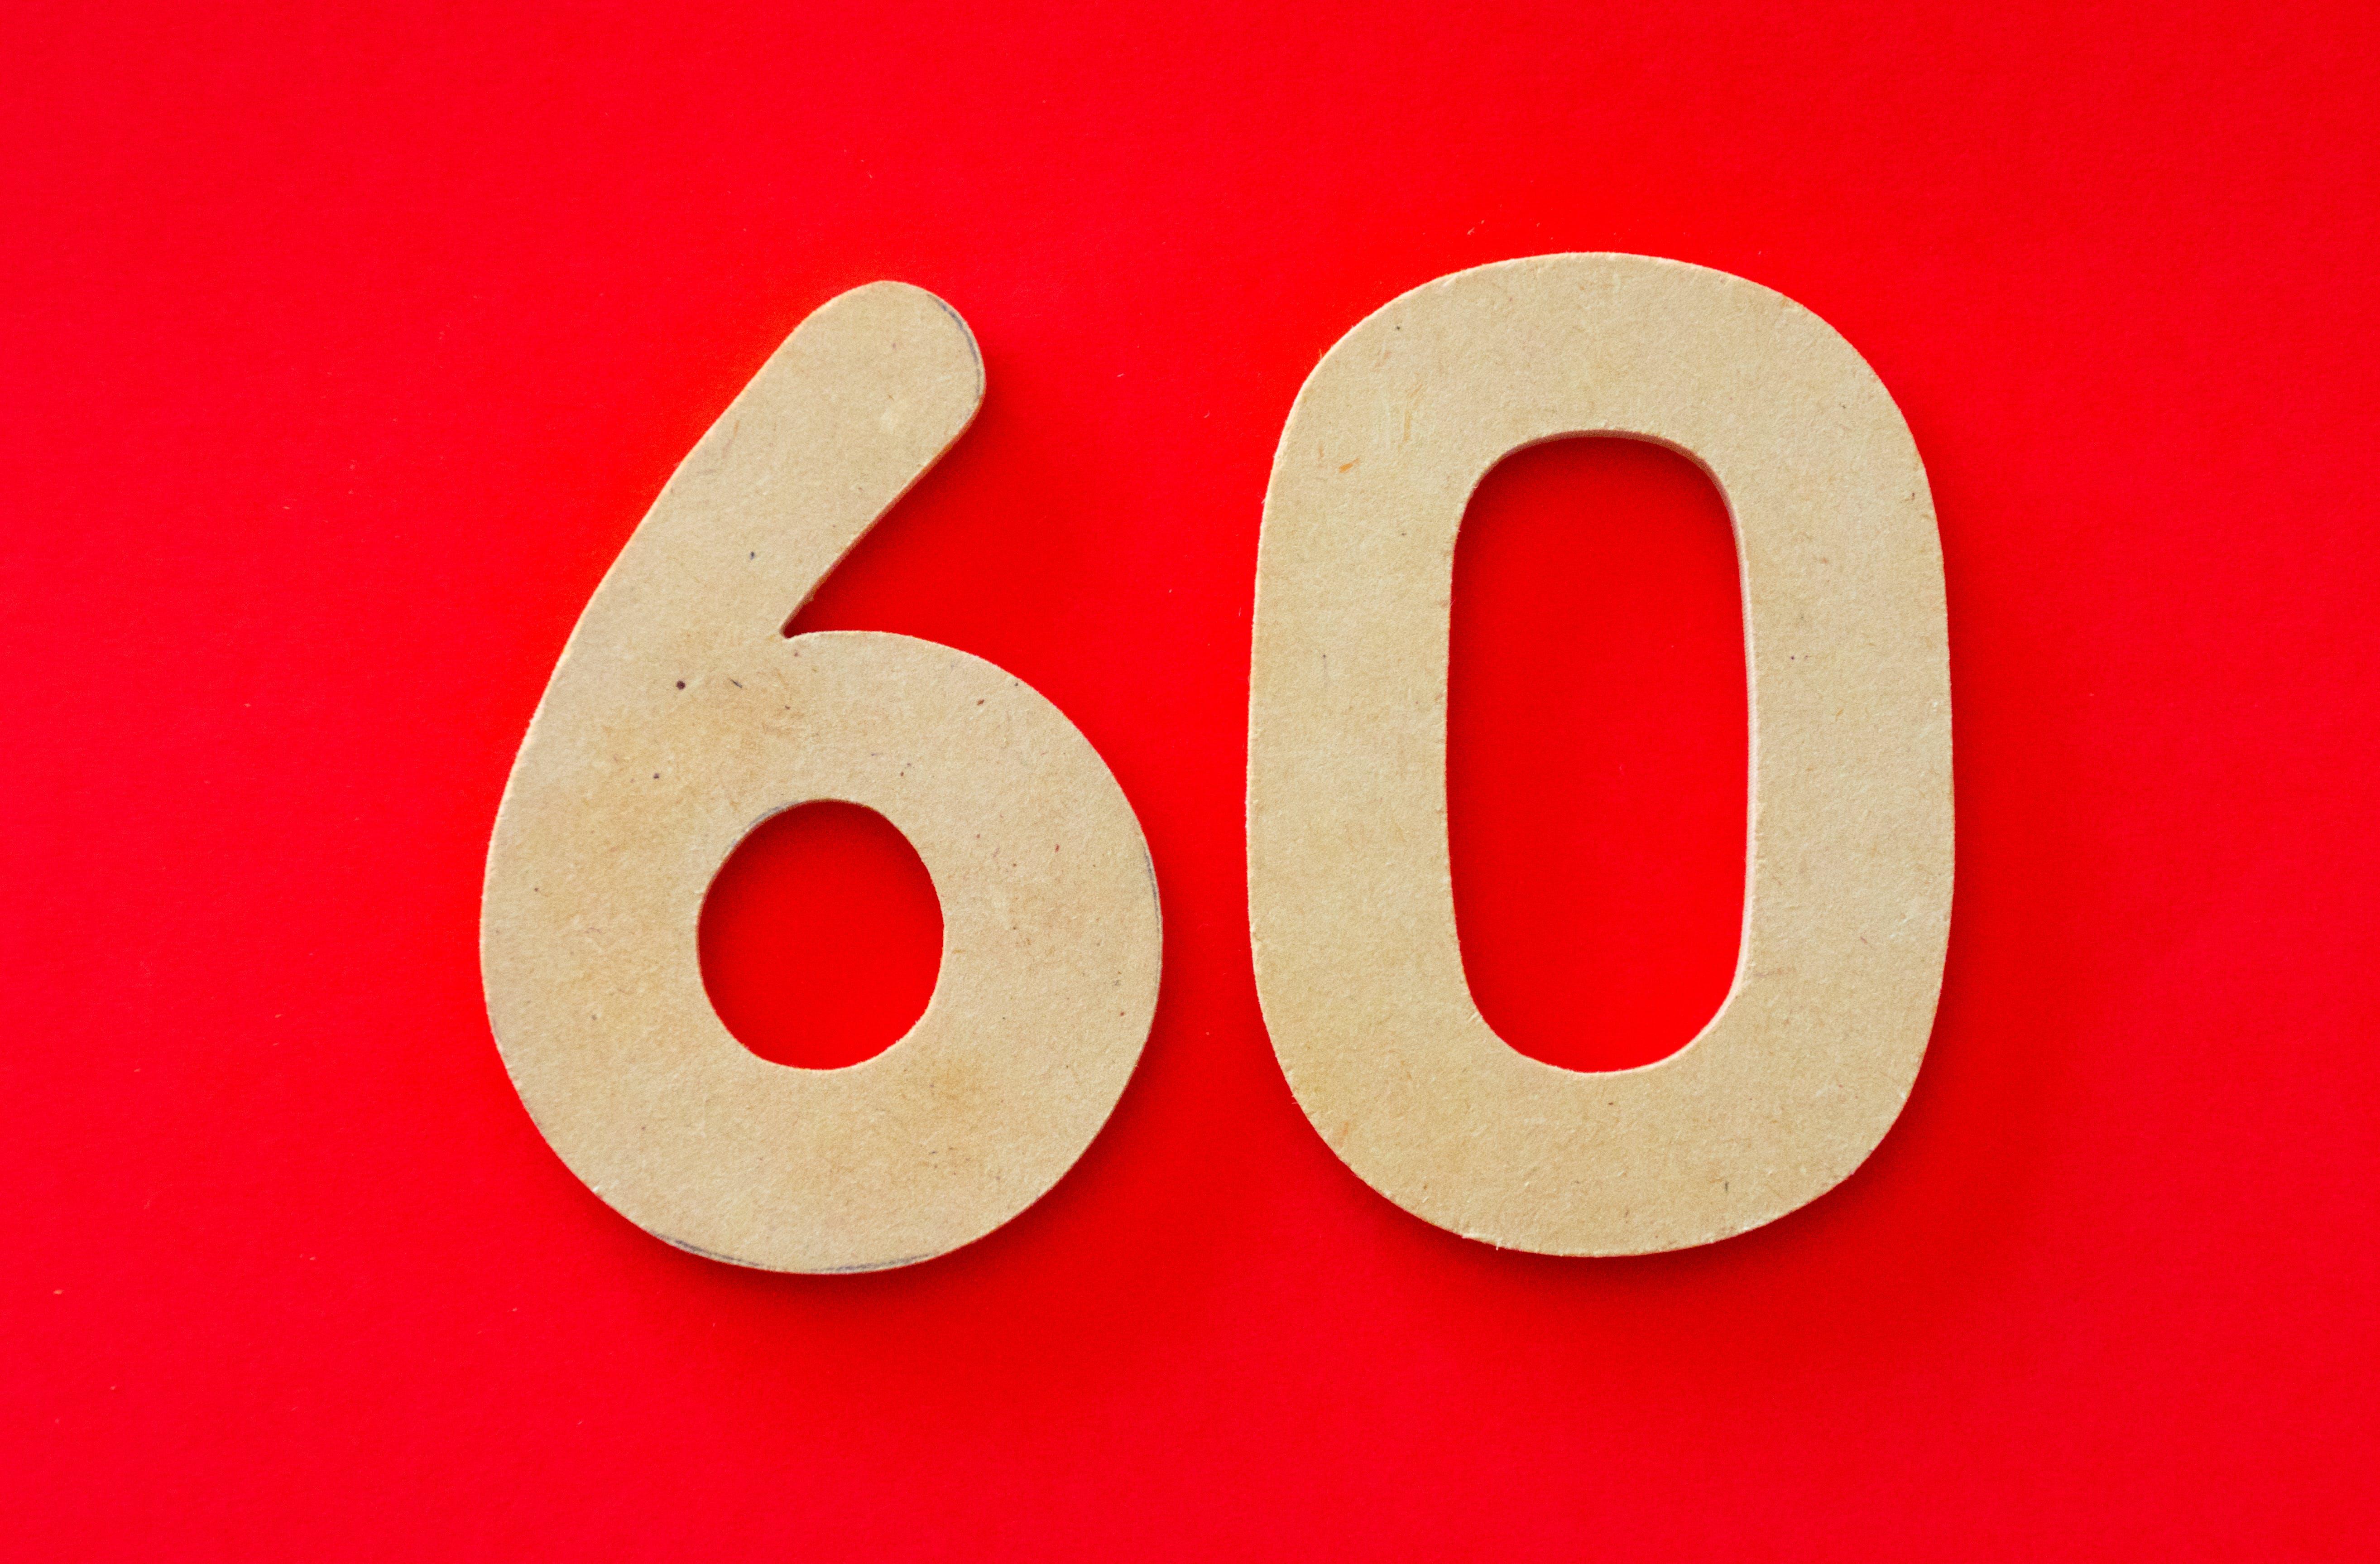 60 Number